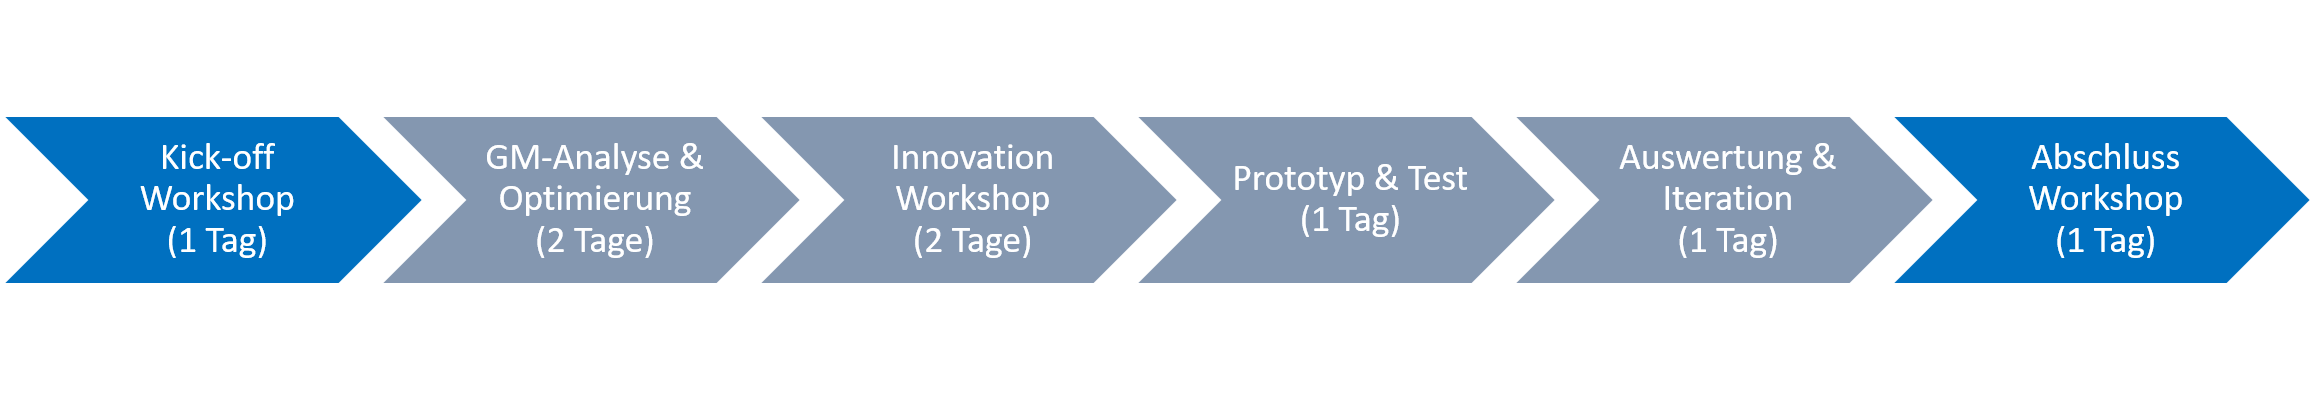 Ablauf des Programms: Kick-off Workshop (1 Tag) - GM-Analyse/Optimierung (2 Tage) - Innovation Workshop (2 Tage) - Prototyp/Test (1 Tag) - Auswertung/Iteration (1 Tag) - Abschluss Workshop (1 Tag)